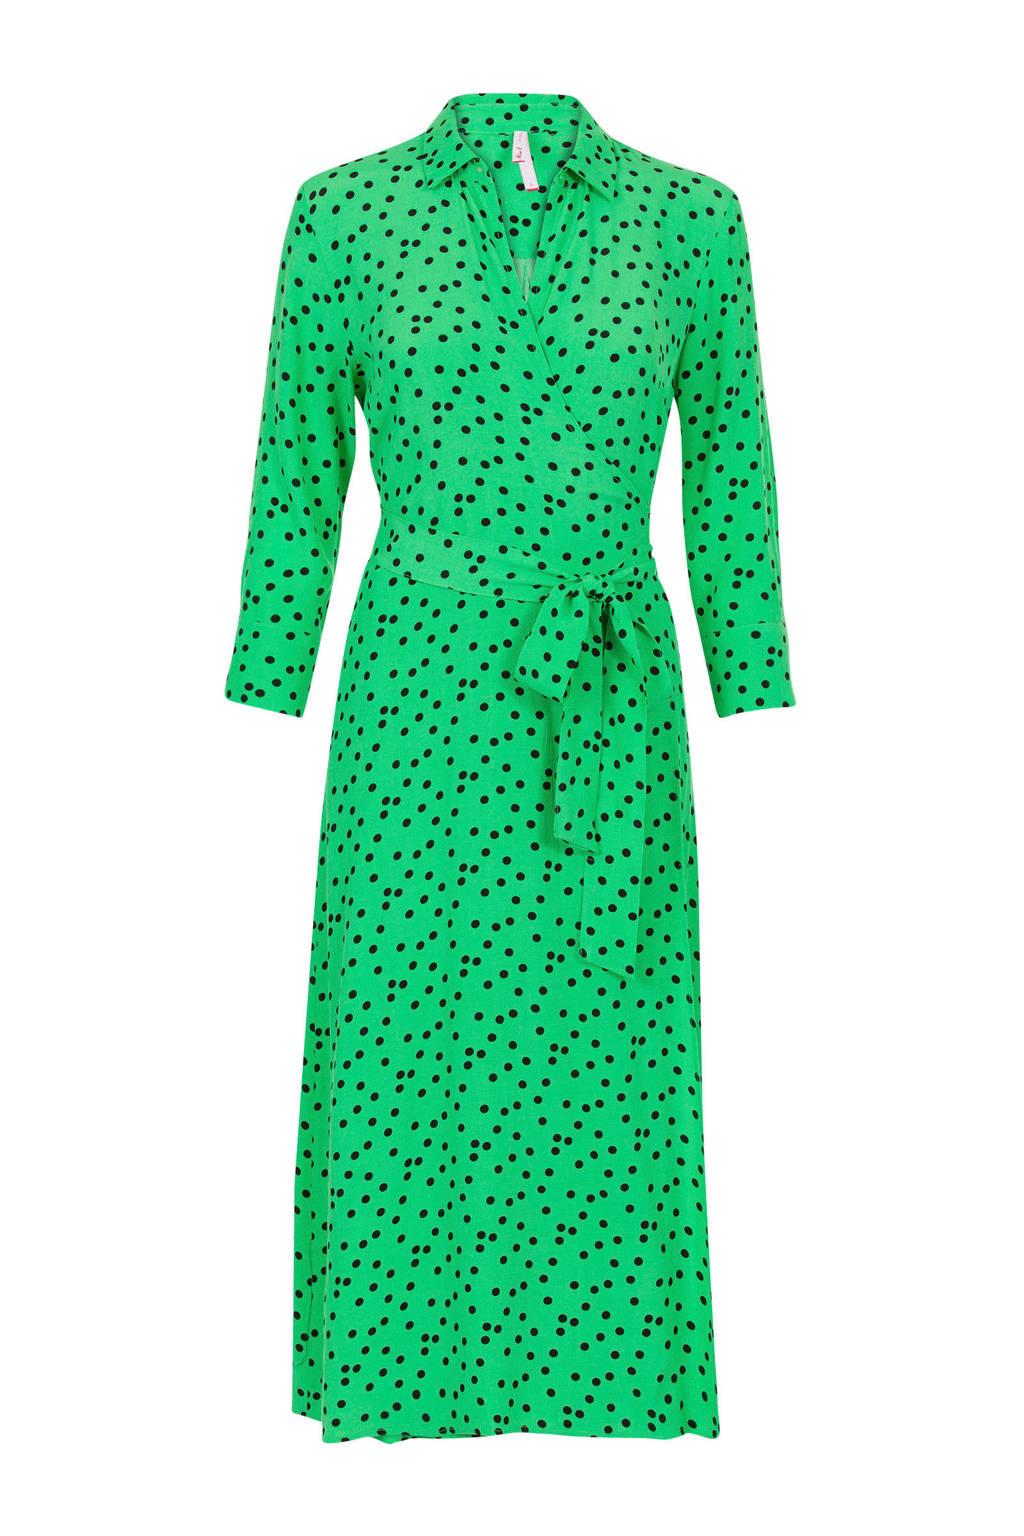 Miss Etam Regulier wikkeljurk met stippen groen, Groen